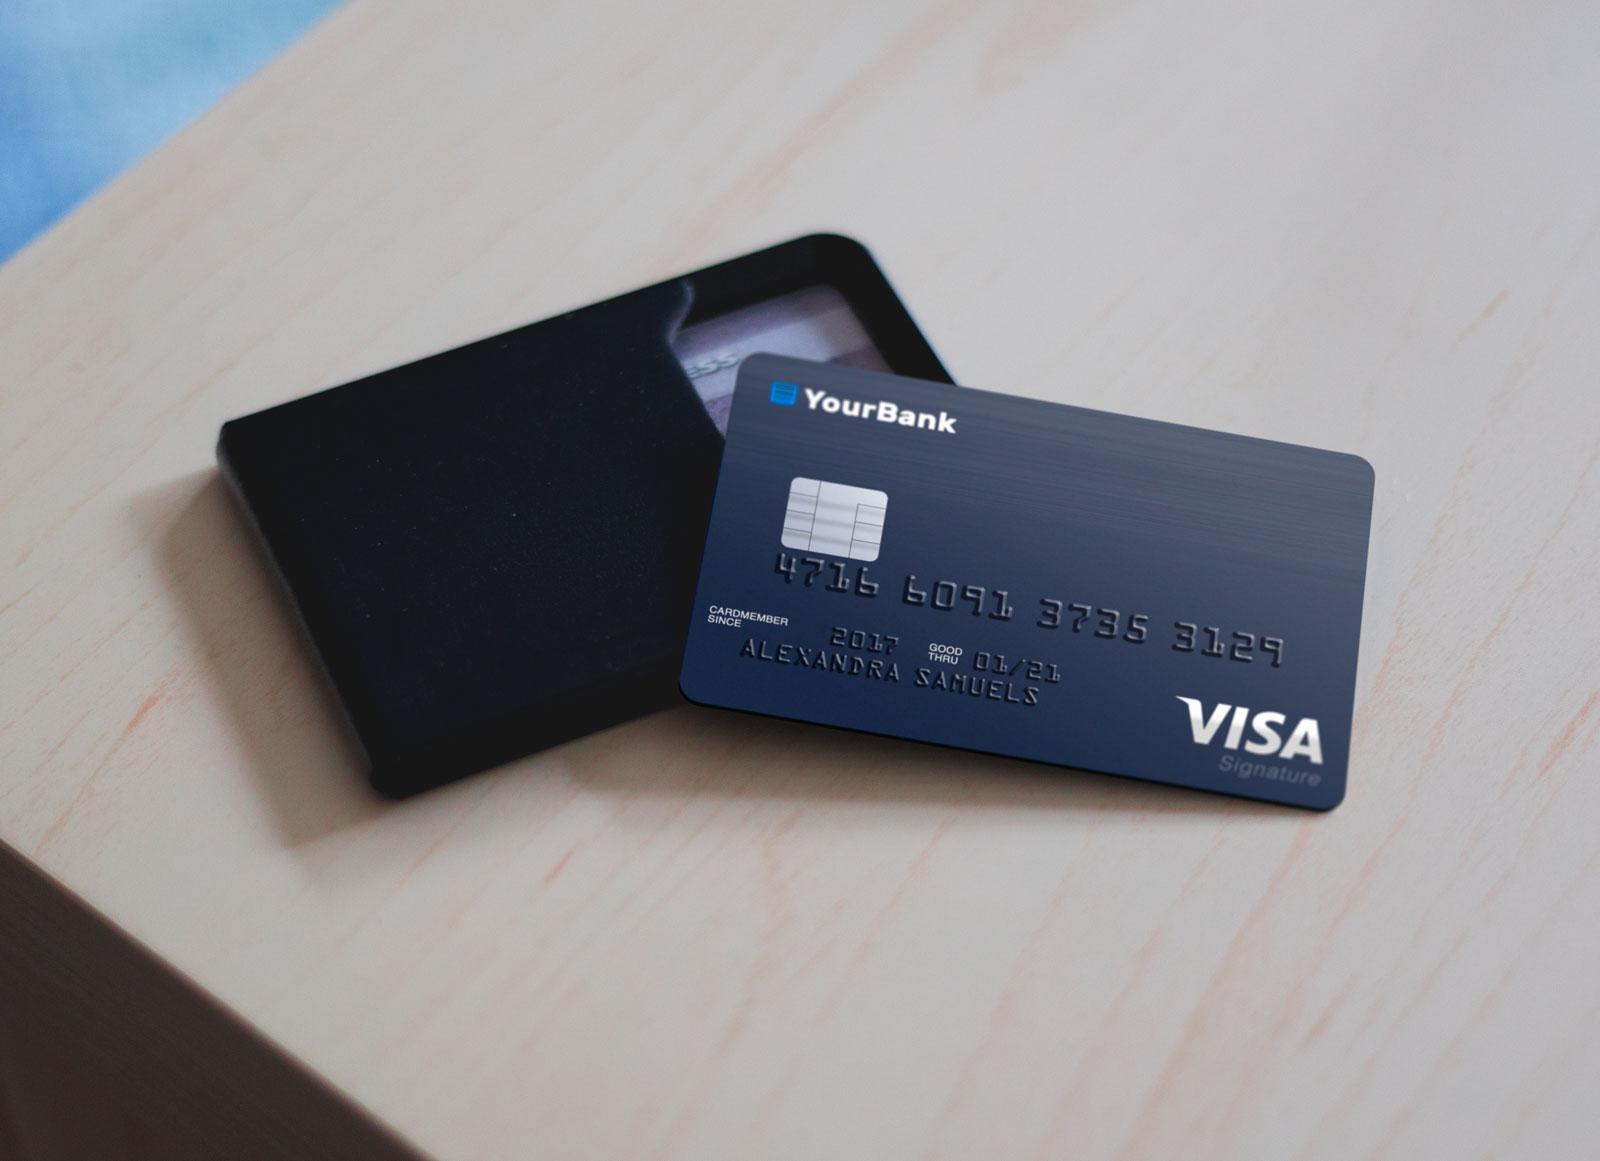 40 Excellent Credit Card Psd Mockup Templates Decolore